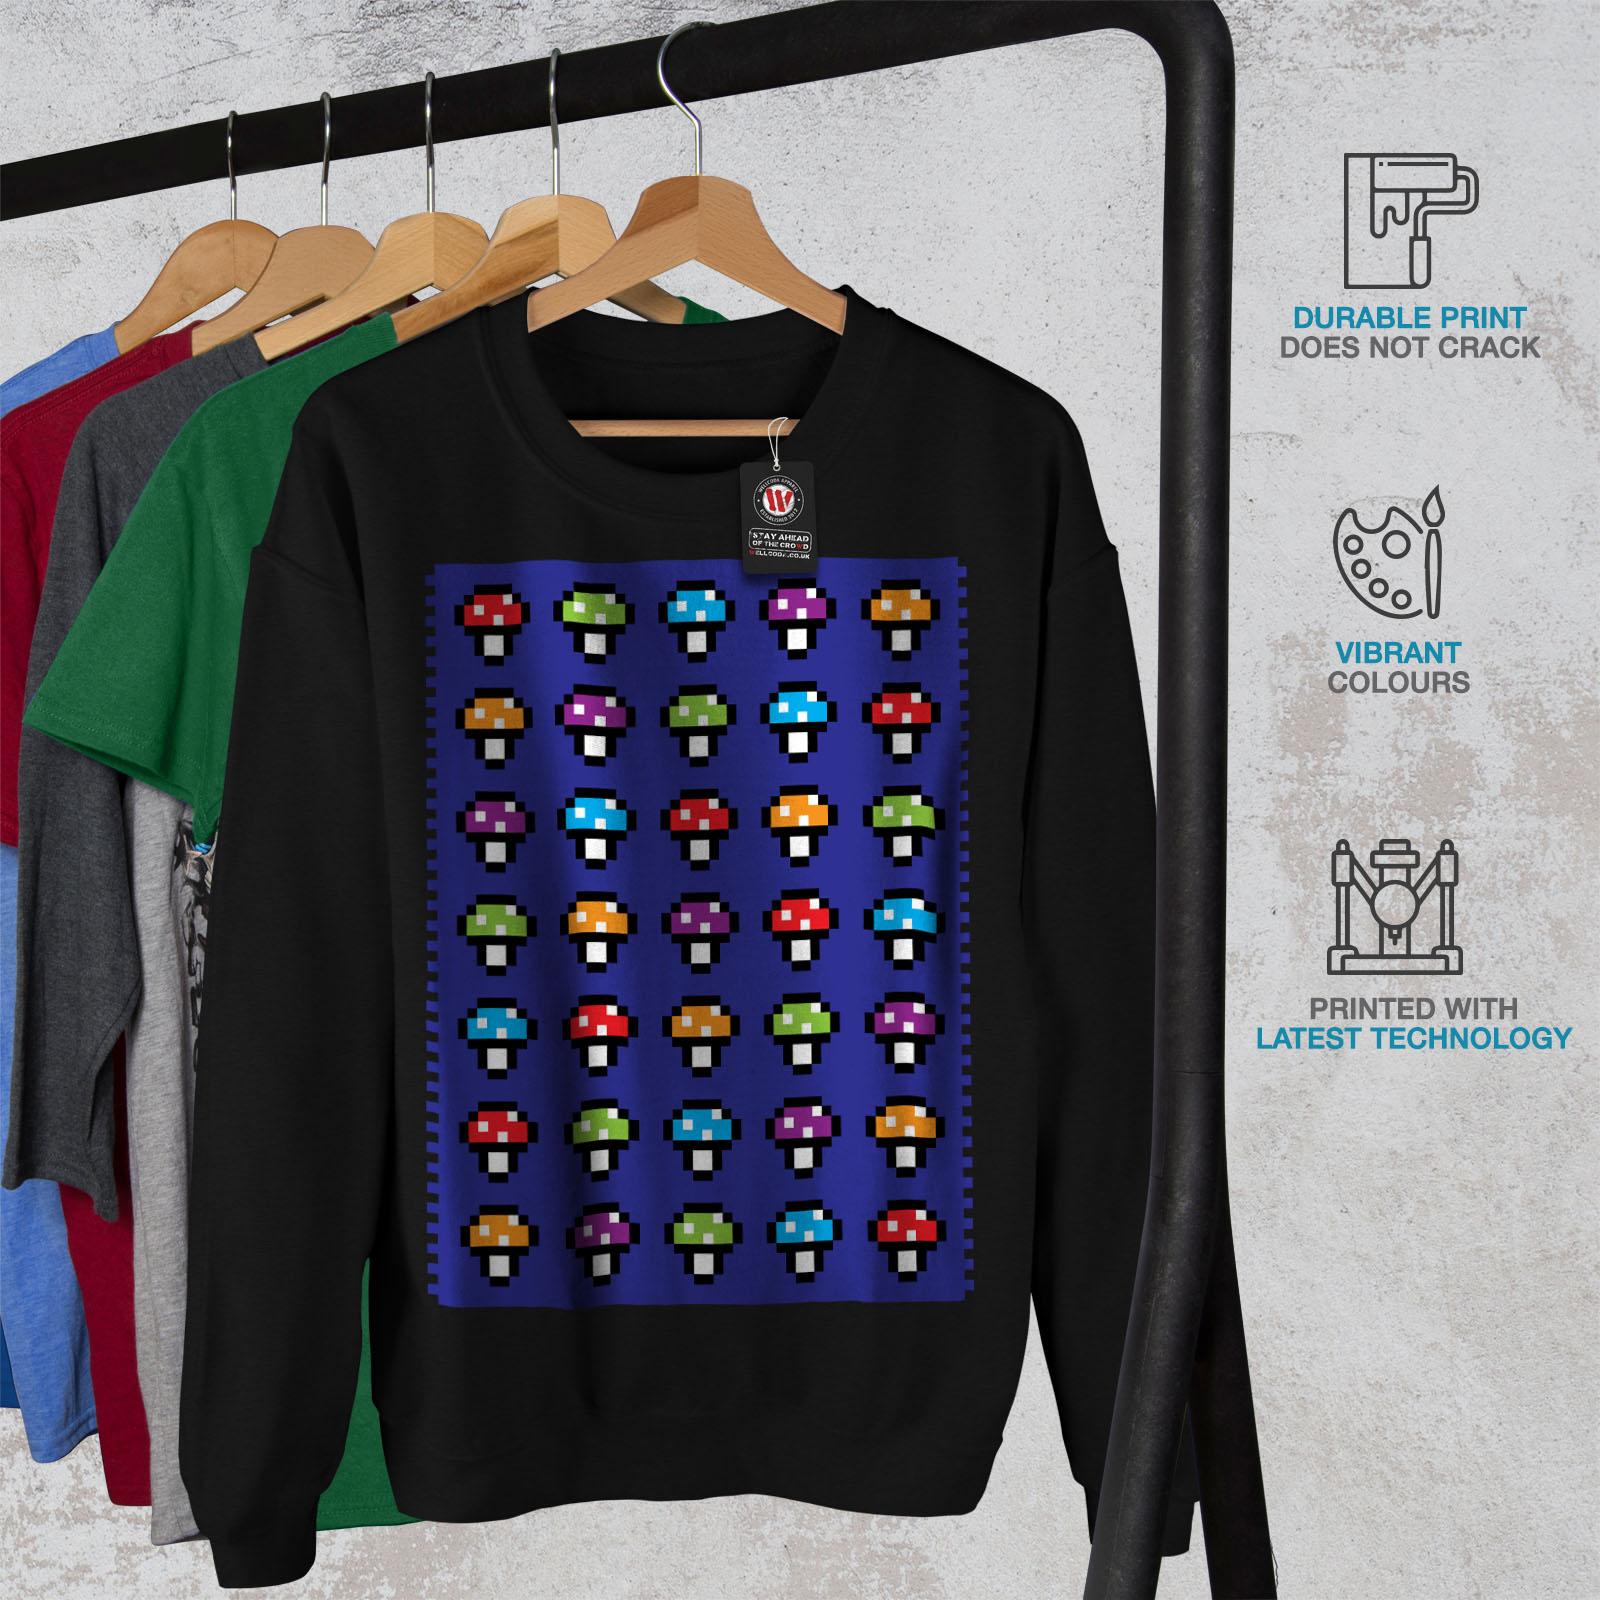 Geek SweatshirtPullover Wellcoda Jumper Casual Funny Shroom Awesome Mens Black mnN8v0wO